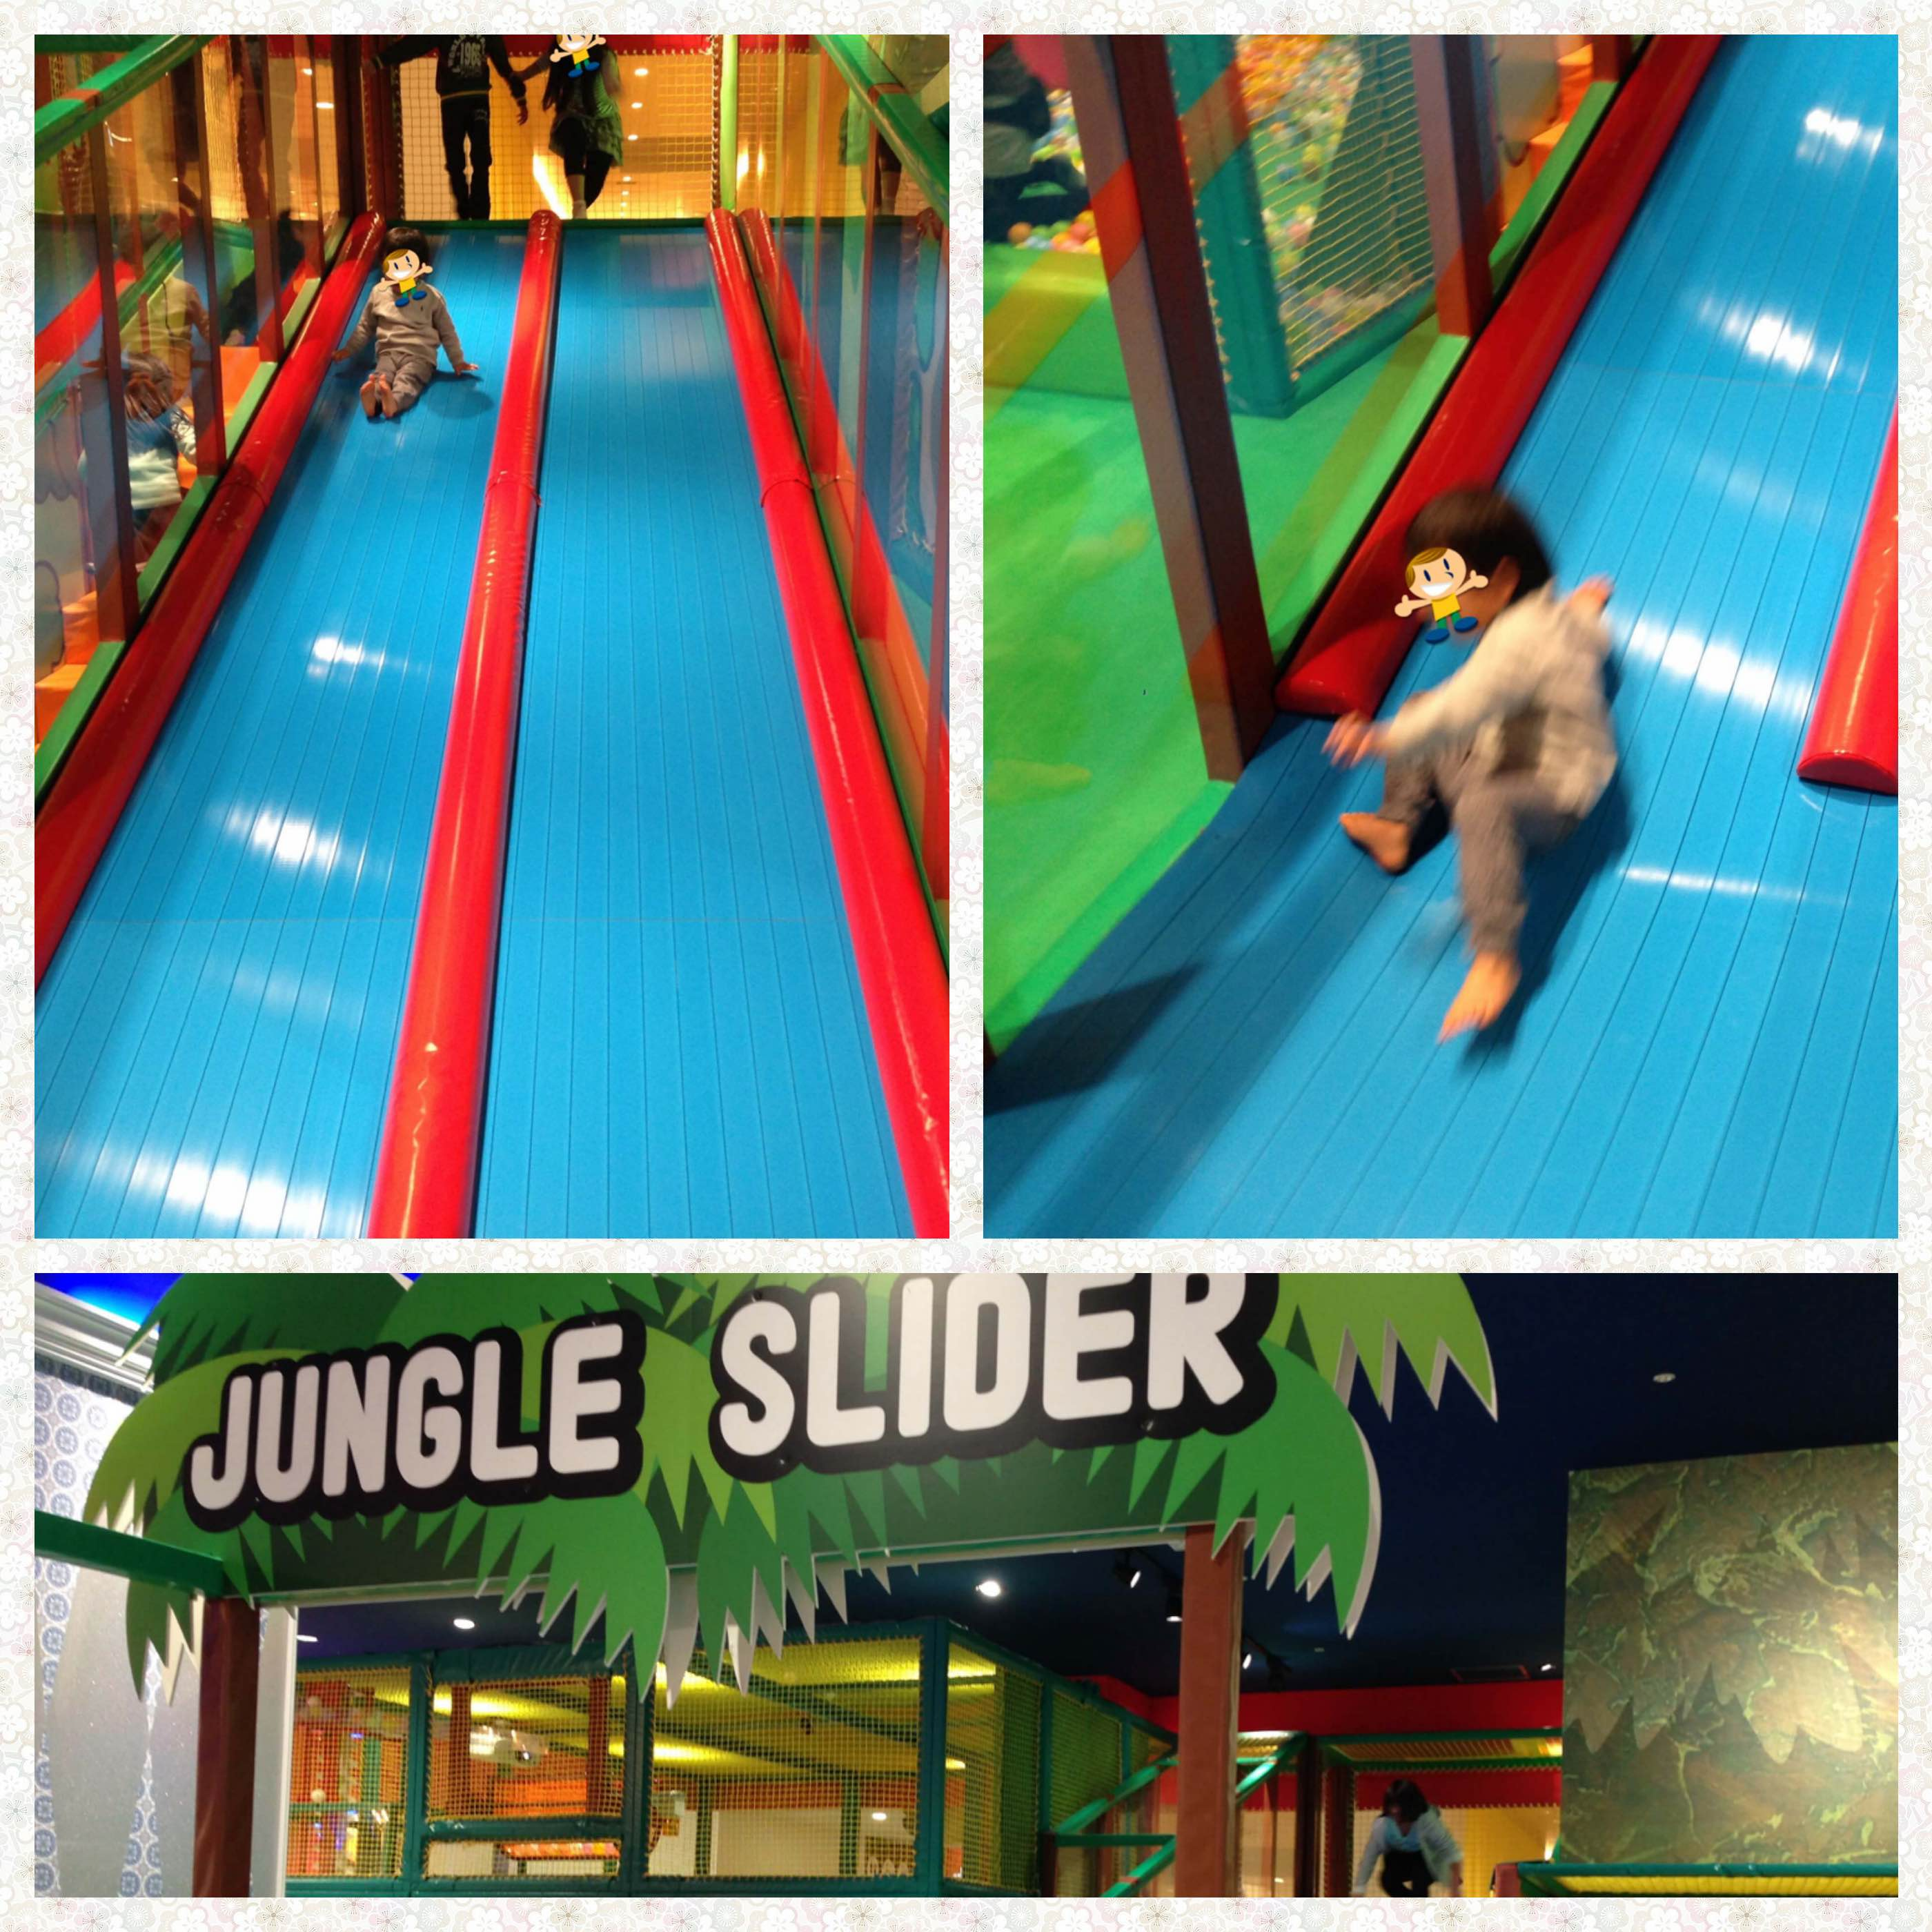 KidsBee_JungleSlider_Fotor